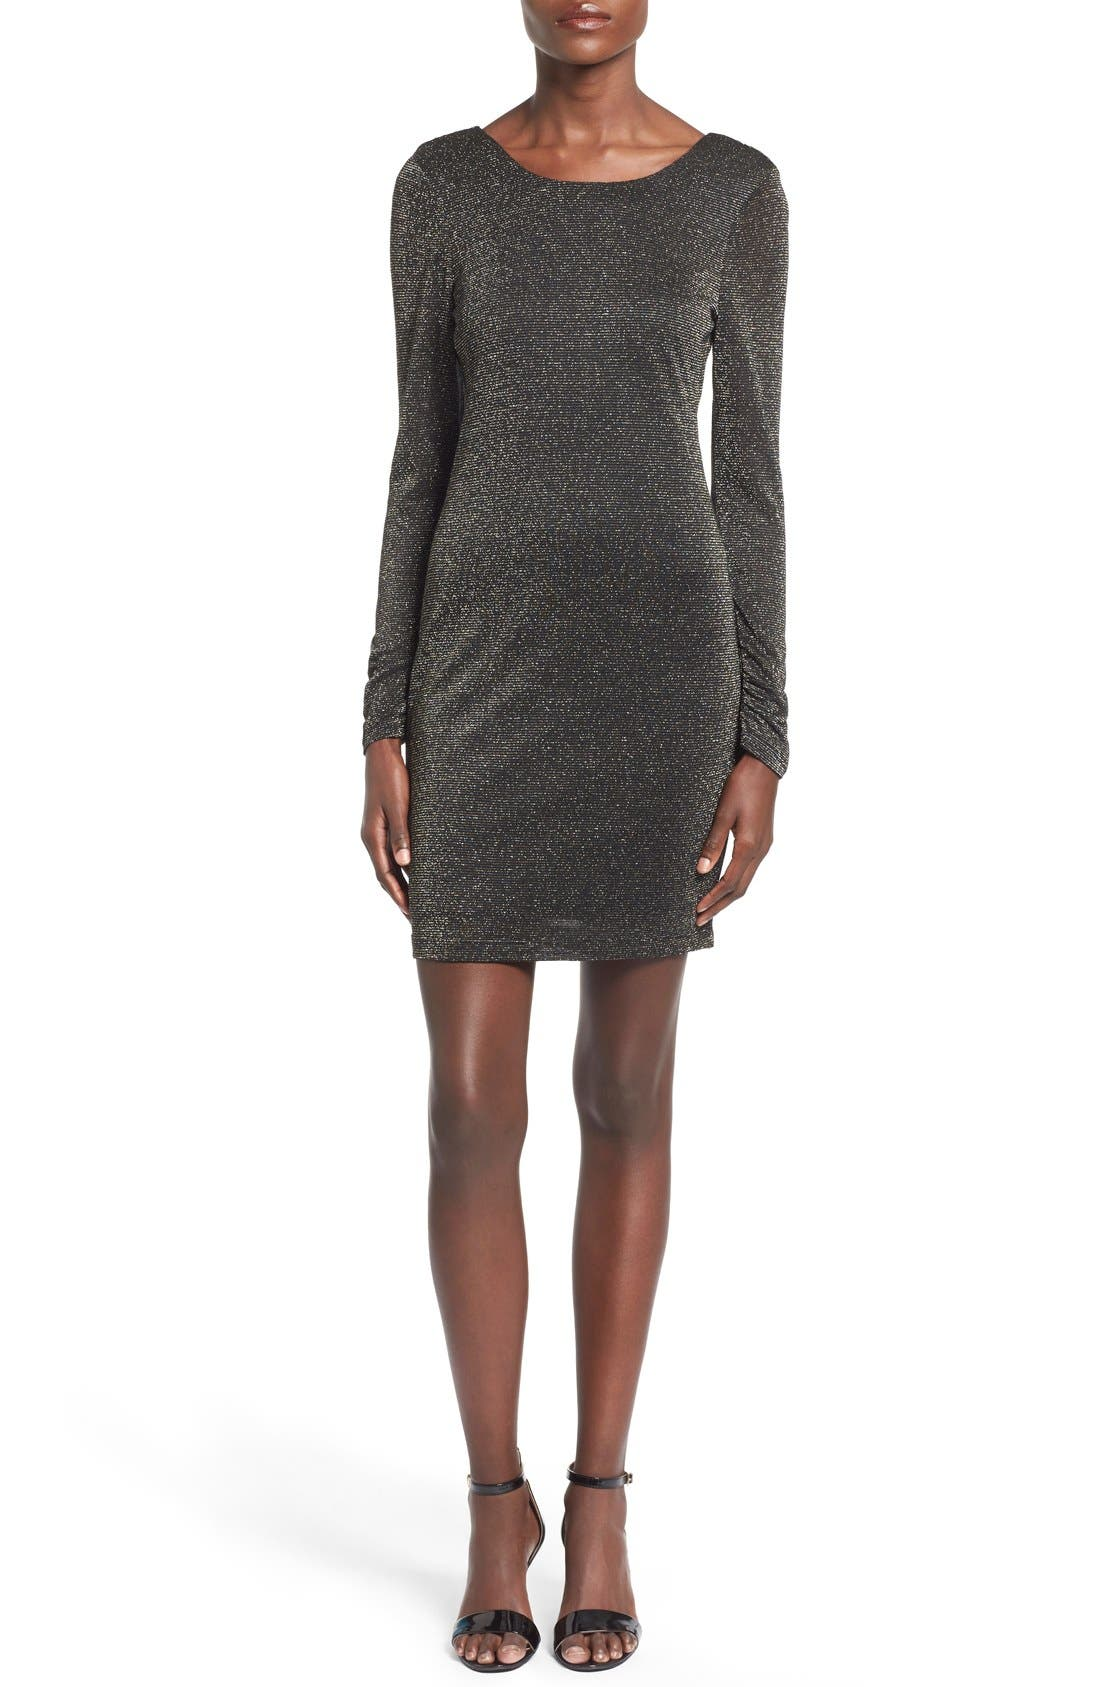 Alternate Image 1 Selected - Speechless Metallic Long Sleeve Sweater Dress